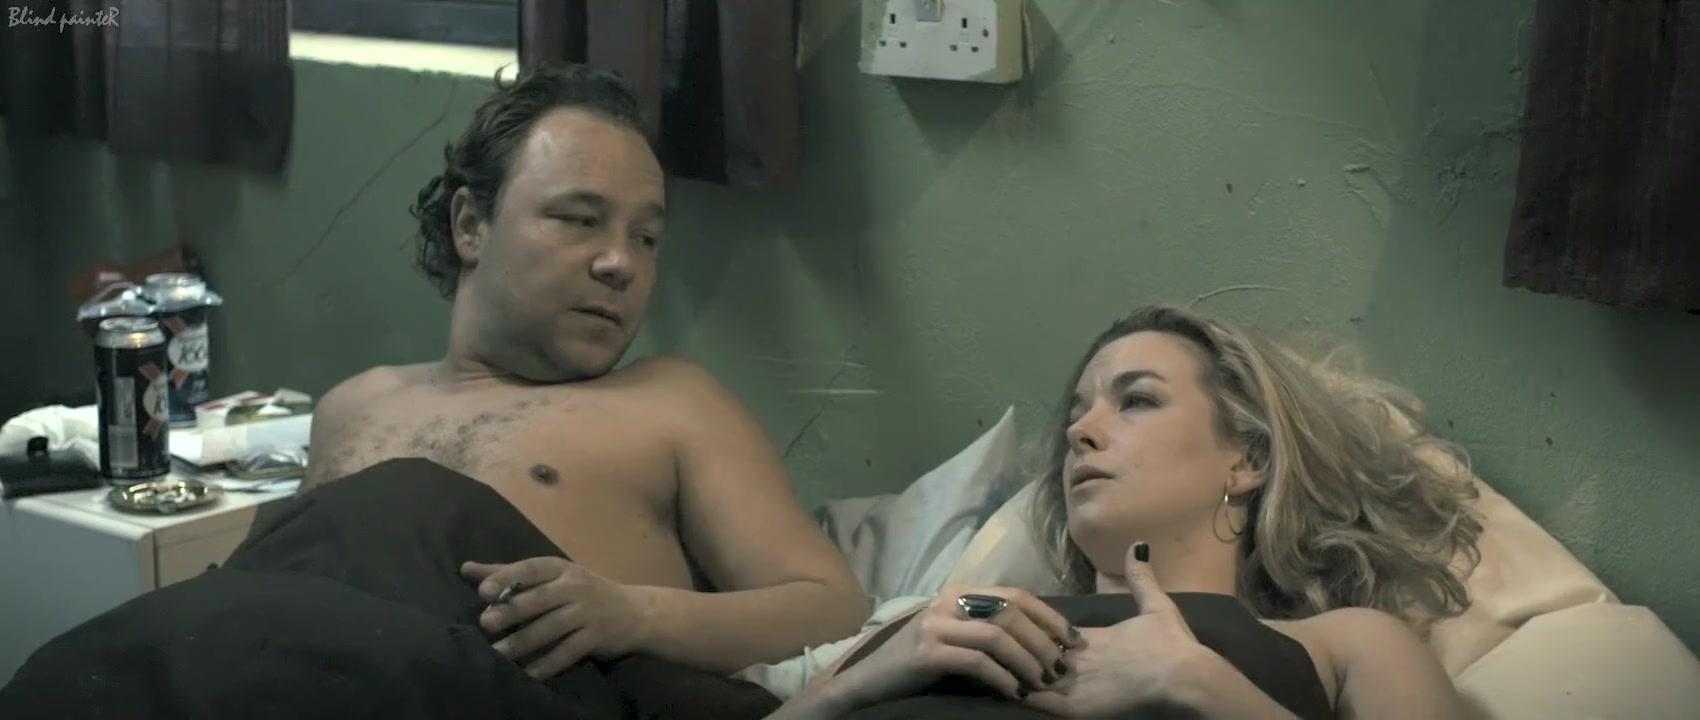 Homeless girls nude porn Naked Galleries